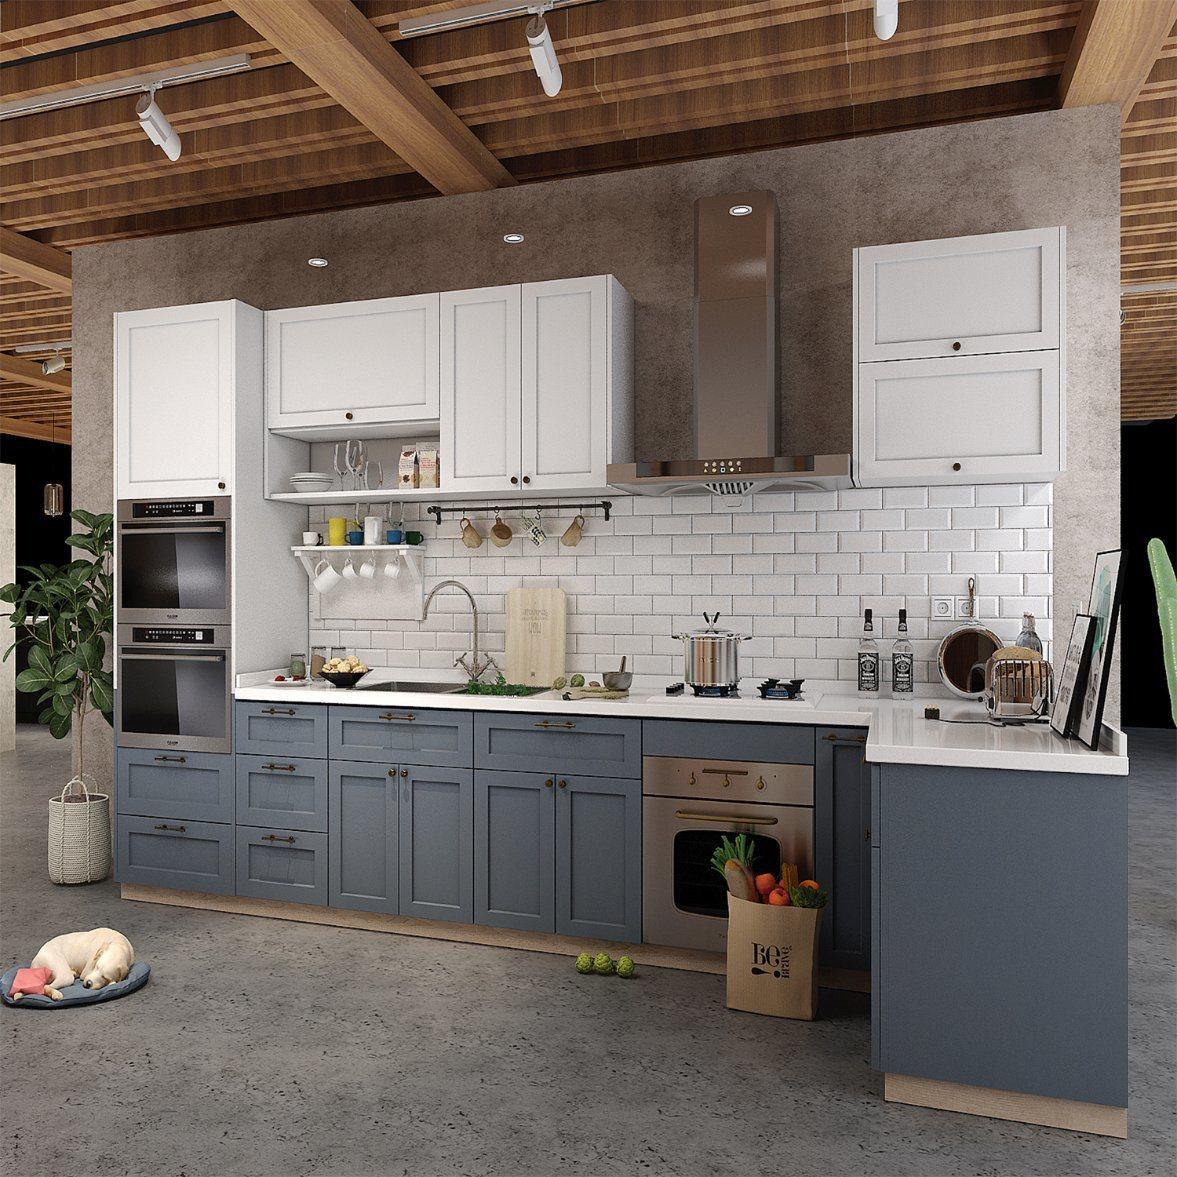 China Cabinetry Kitchen Custom Design Melamine Kitchen Cabinet ...